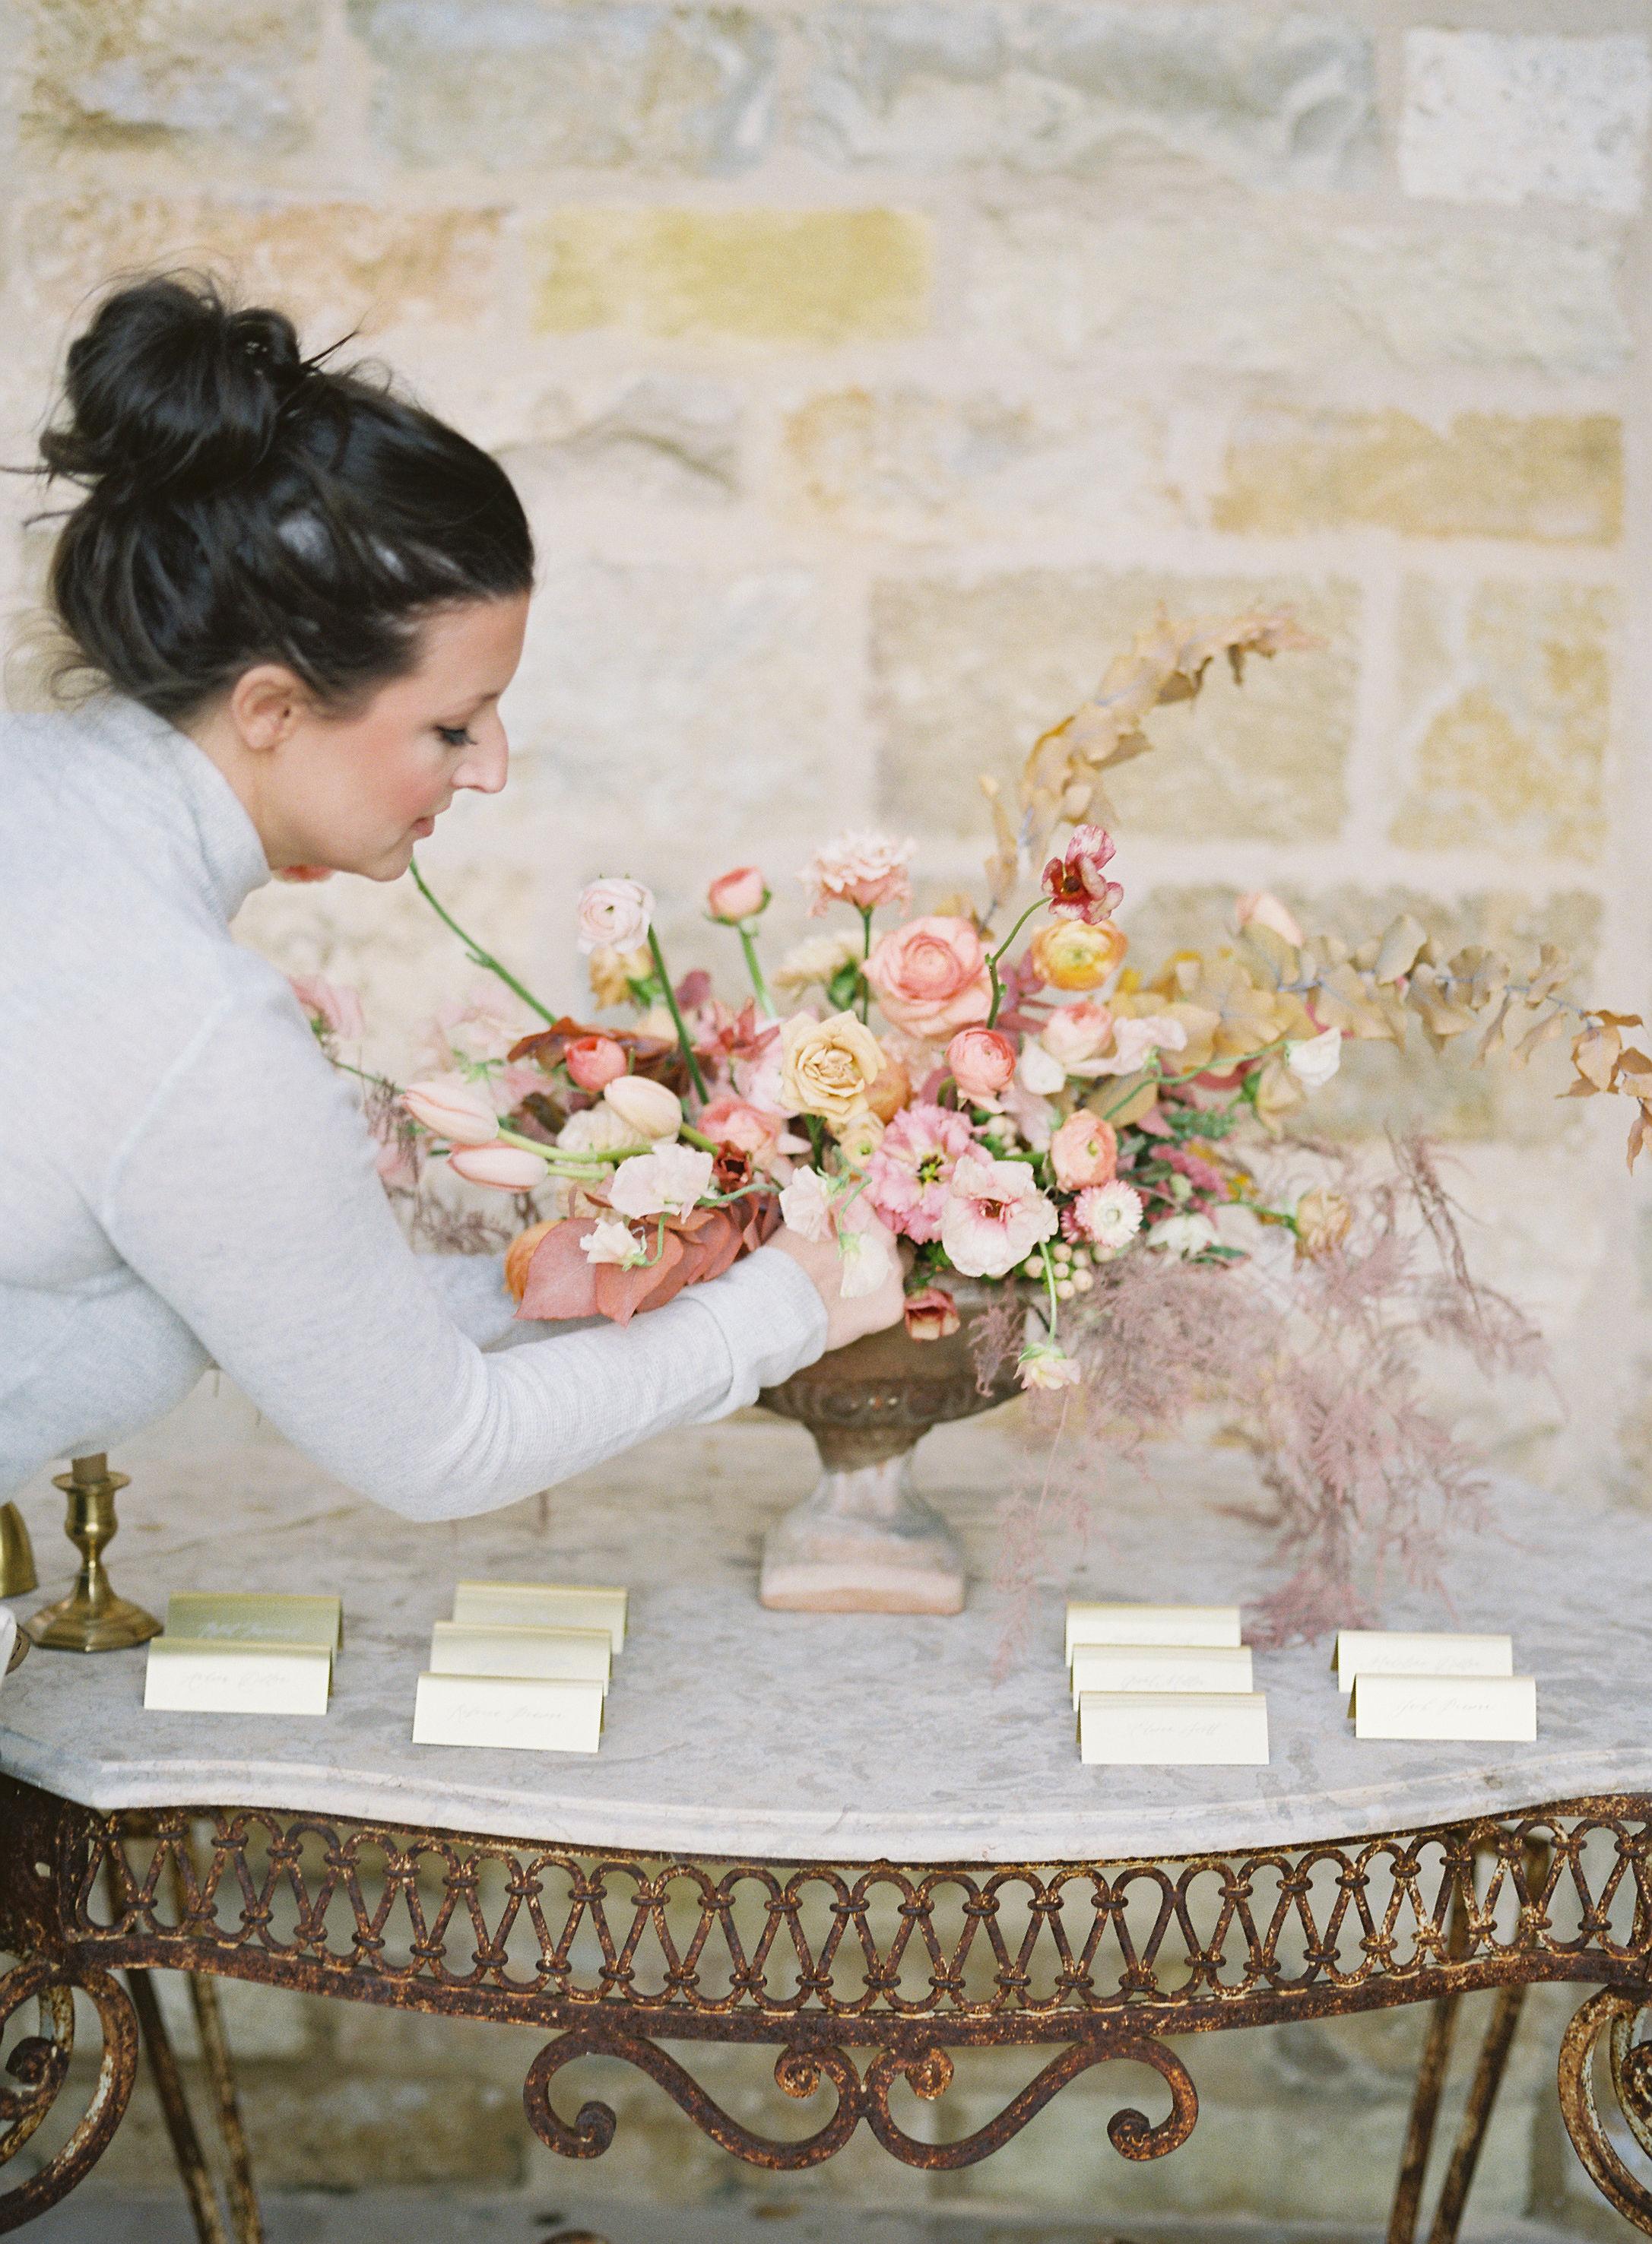 Jessica-Zimmerman-Events-Floral-Design-Education.JPG